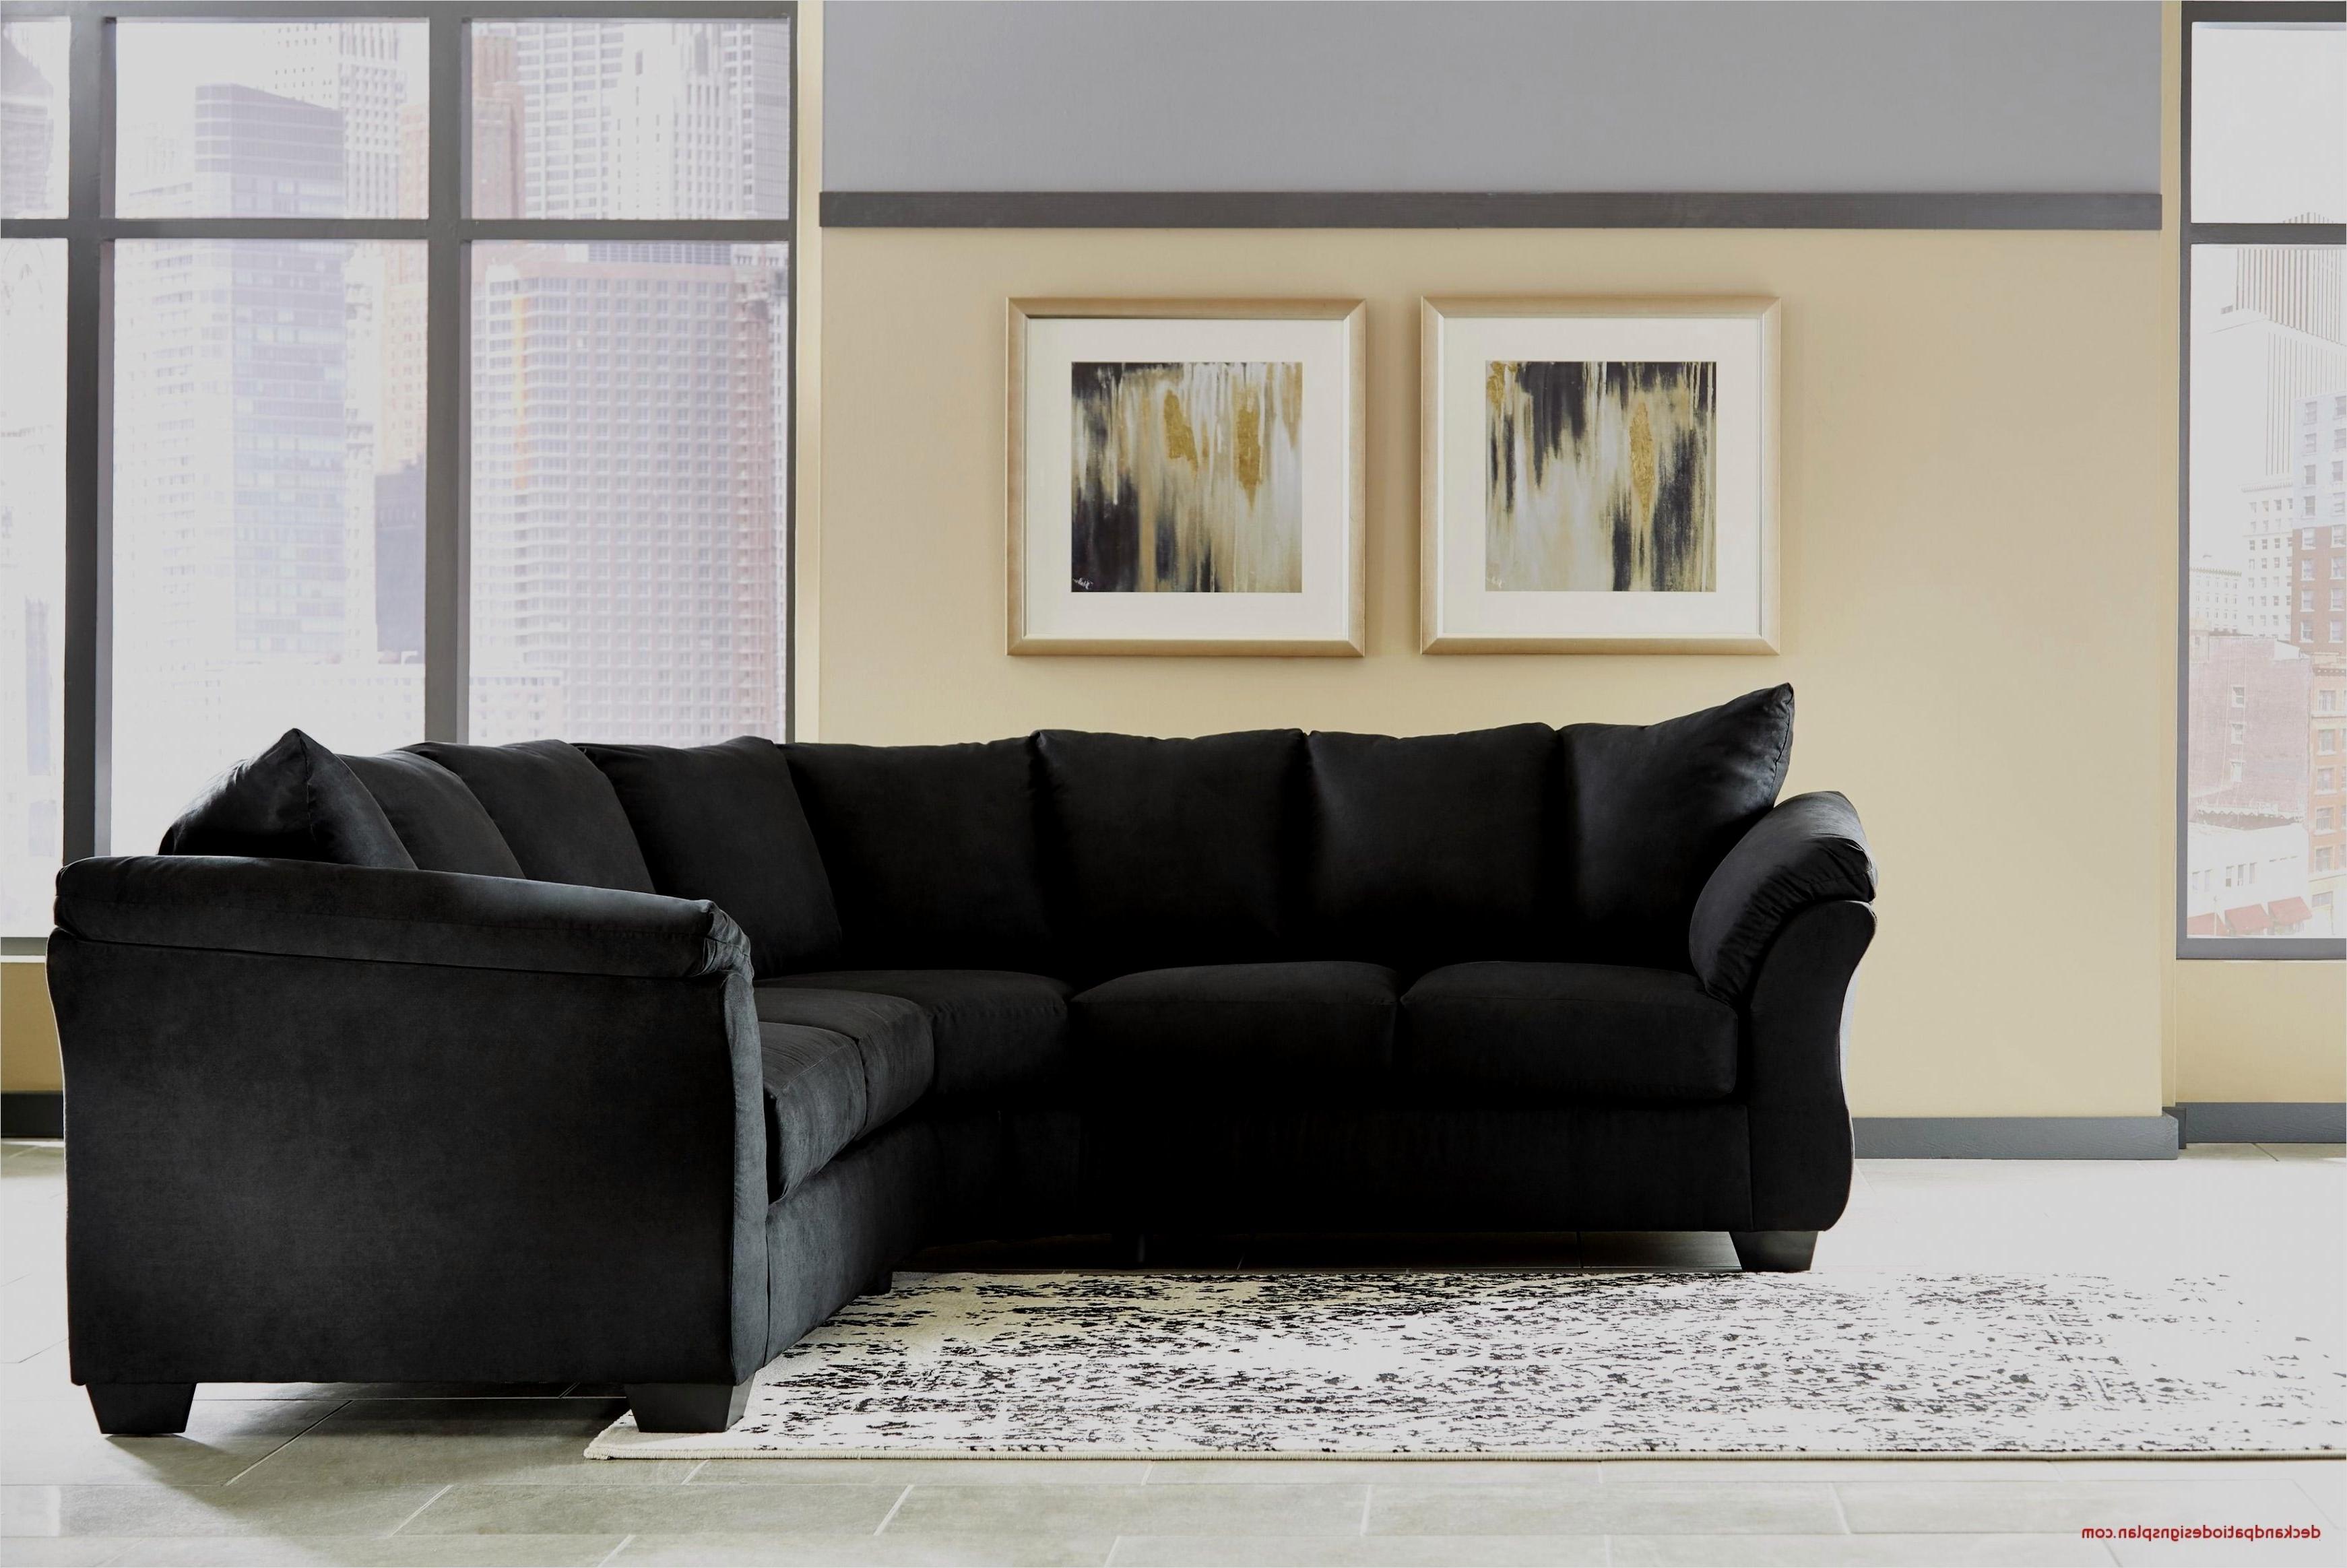 Sofas Valencia Outlet D0dg sofas Valencia Outlet Bello 40 Elegant sofa L form Lapetitemaisonnyc